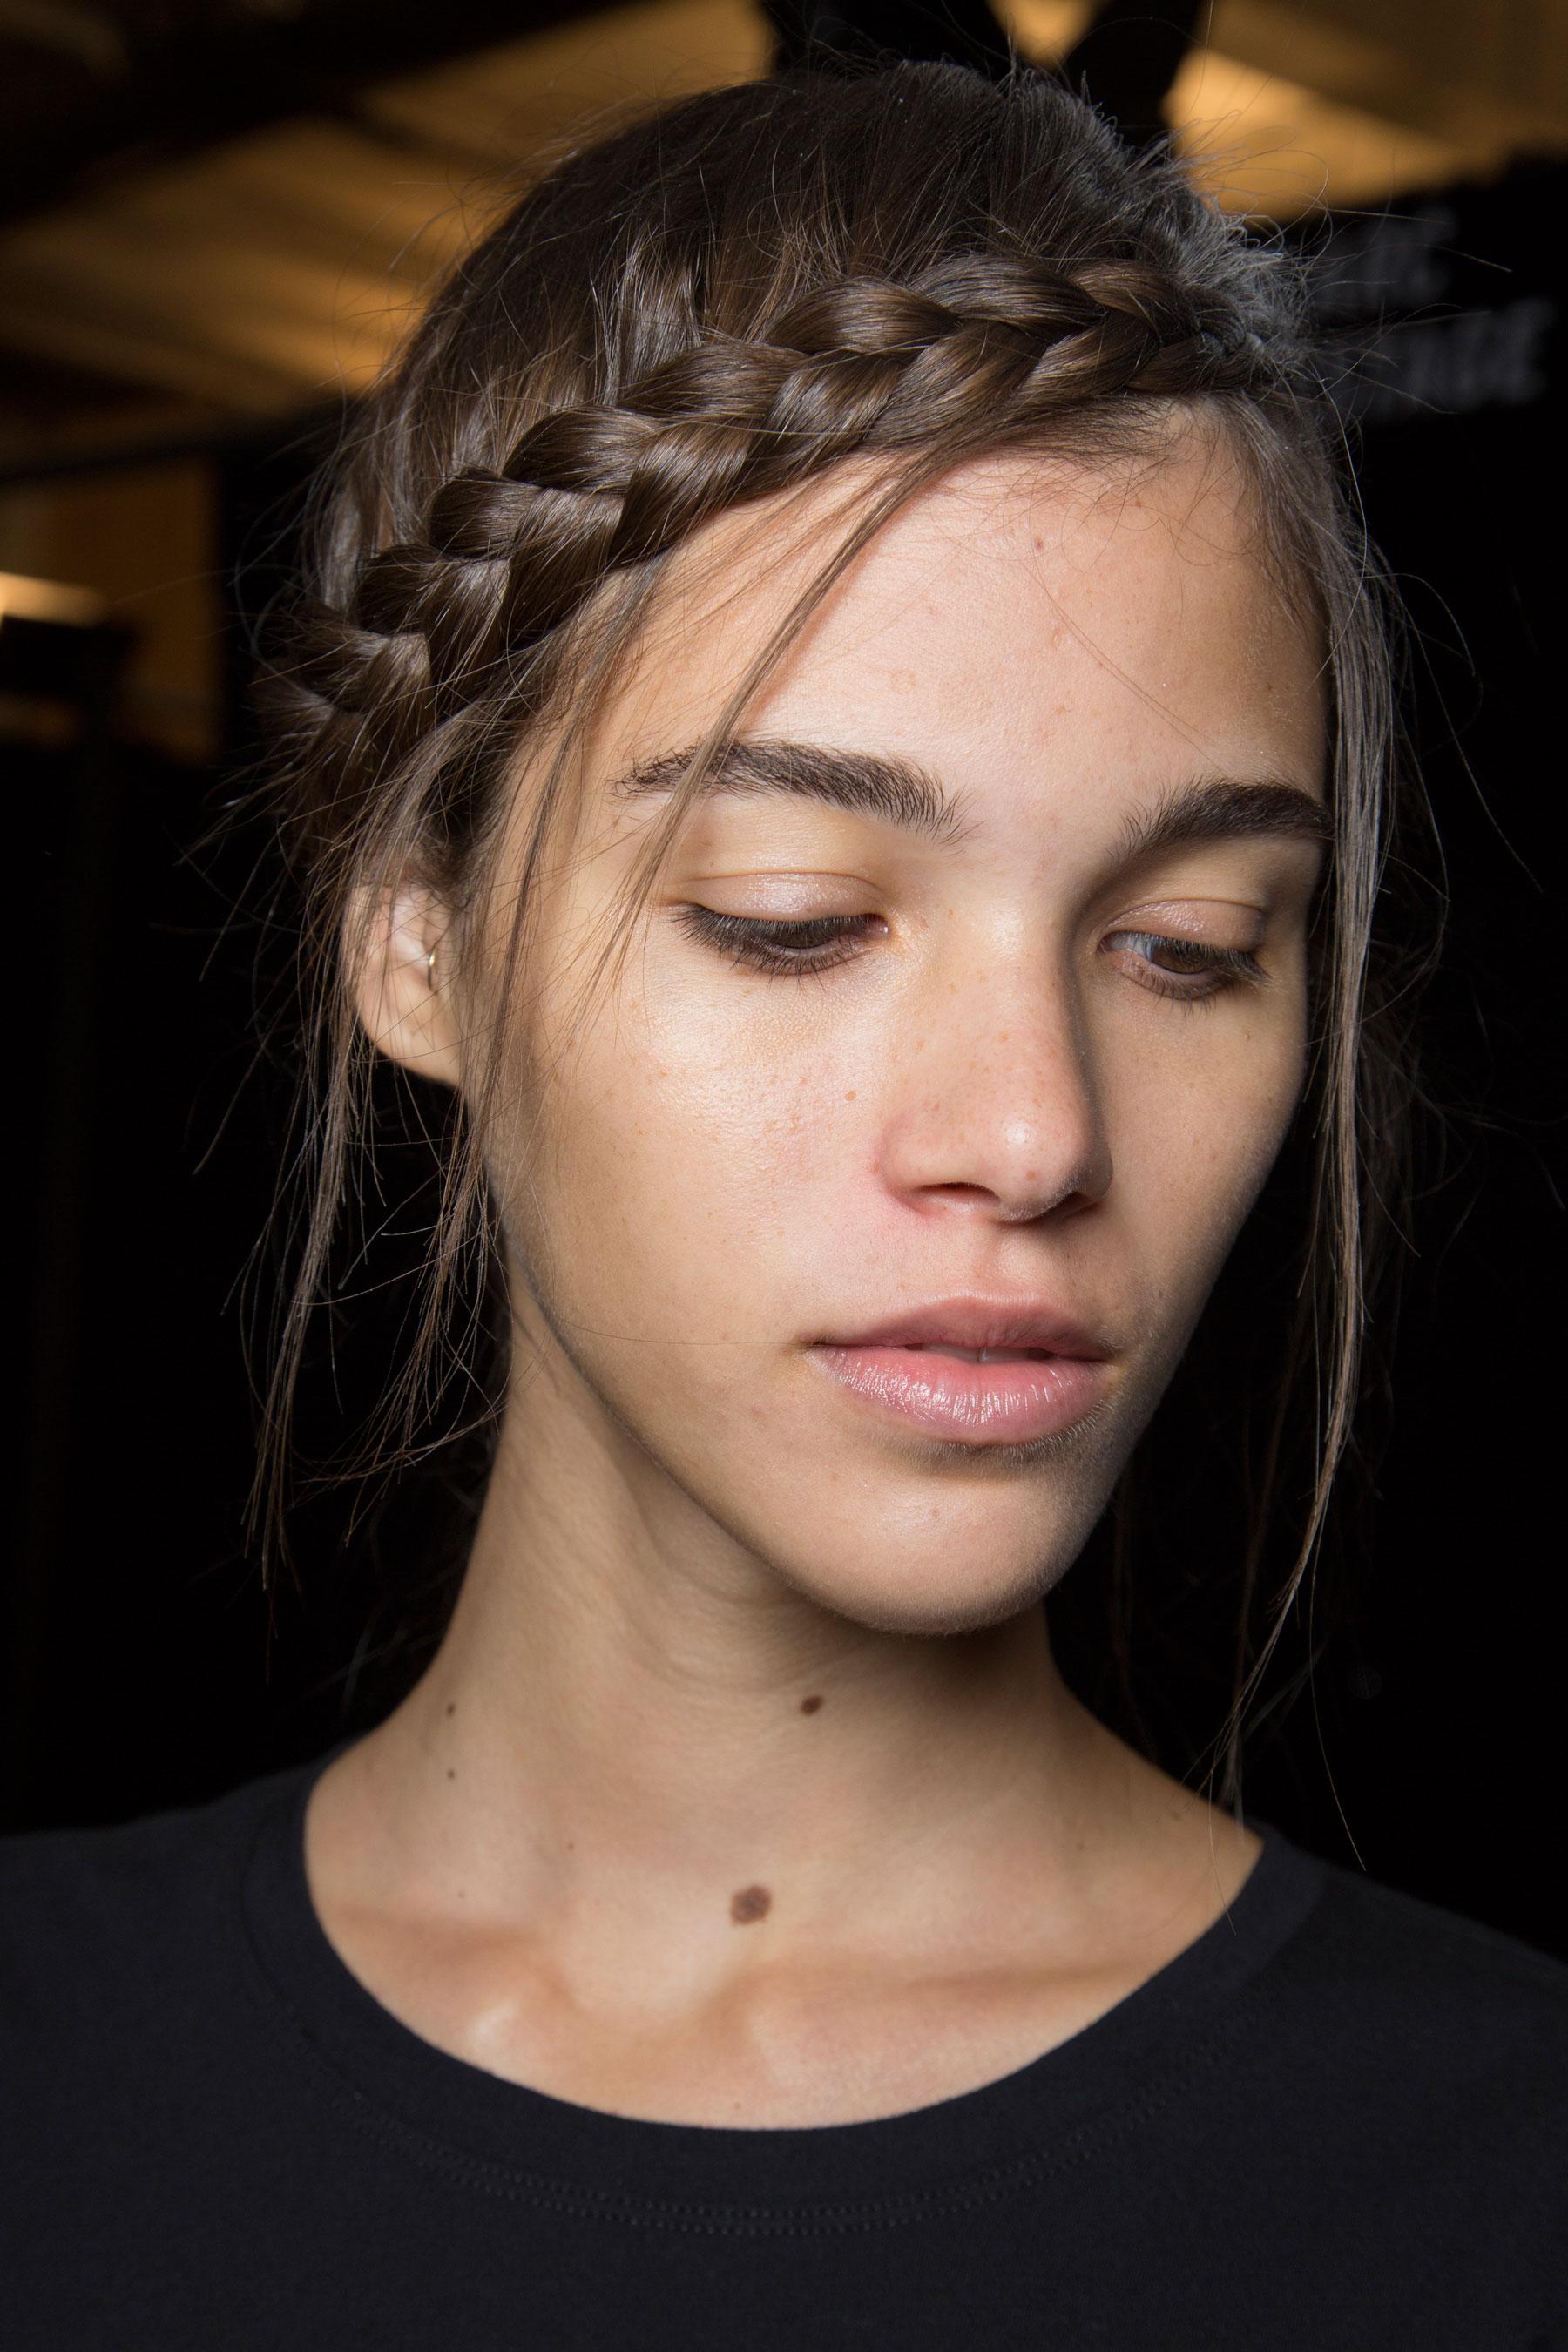 Herve-Leger-backstage-beauty-spring-2016-fashion-show-the-impression-63